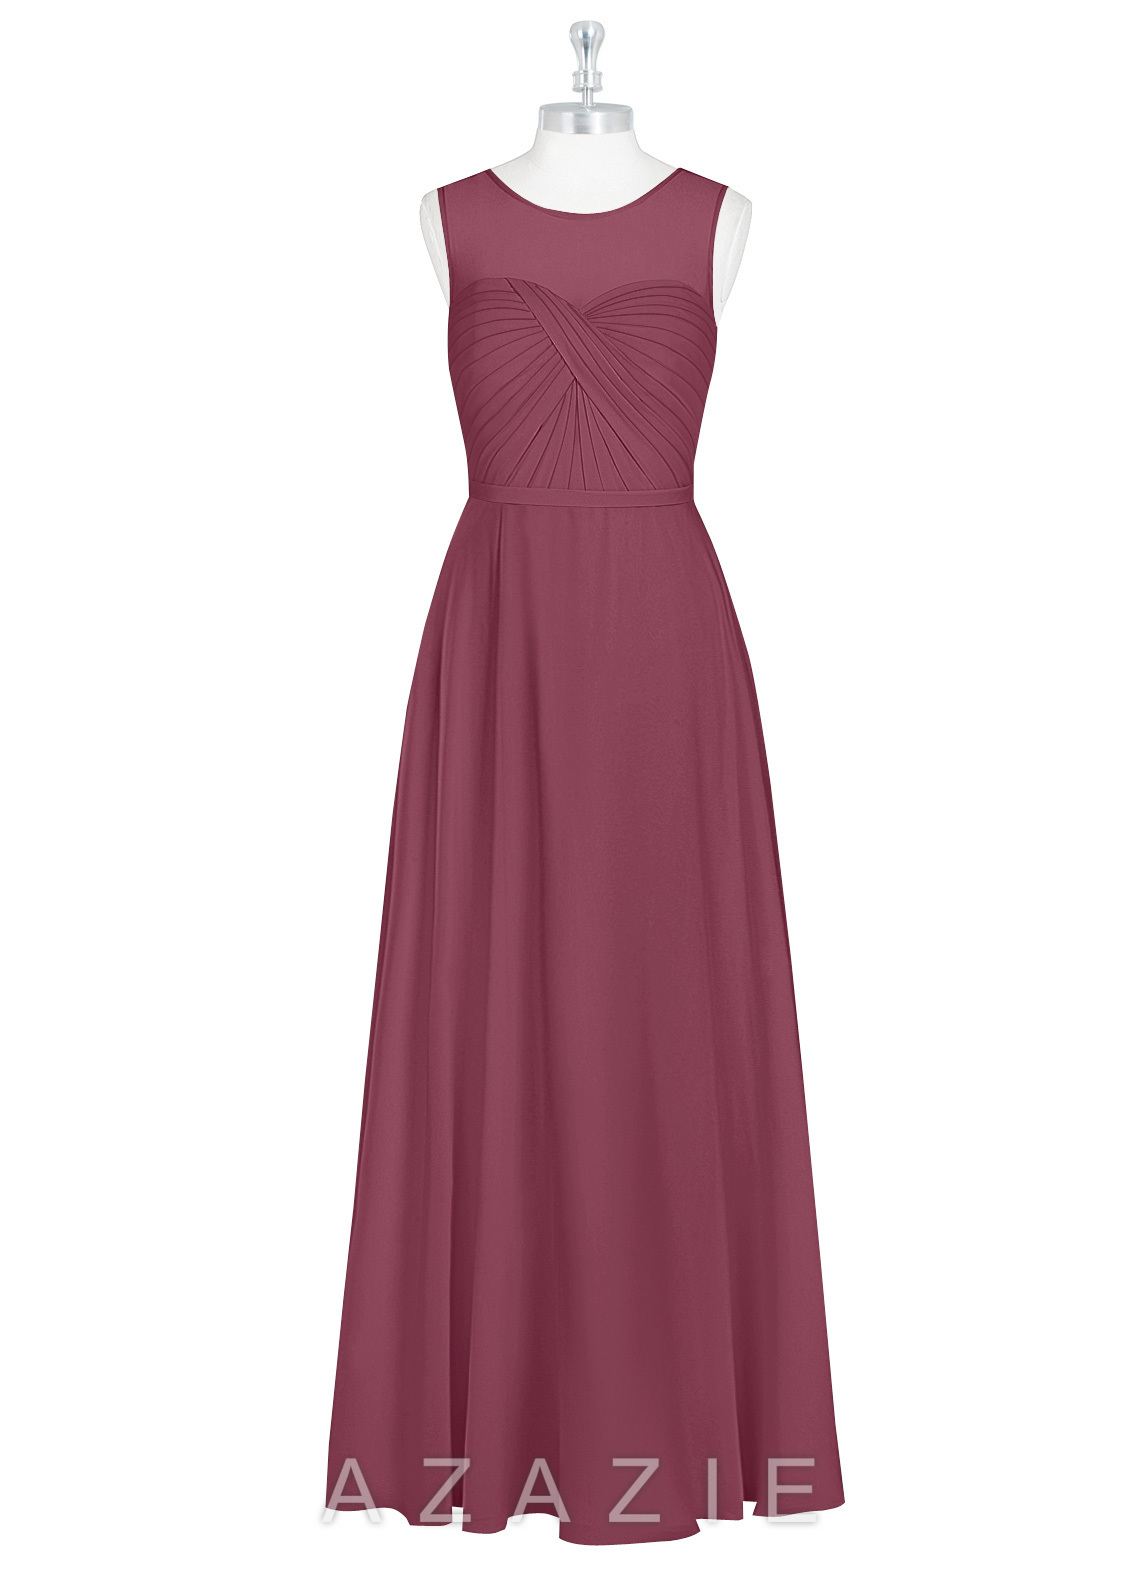 8df798a1bf1 Azazie Justine Bridesmaid Dresses